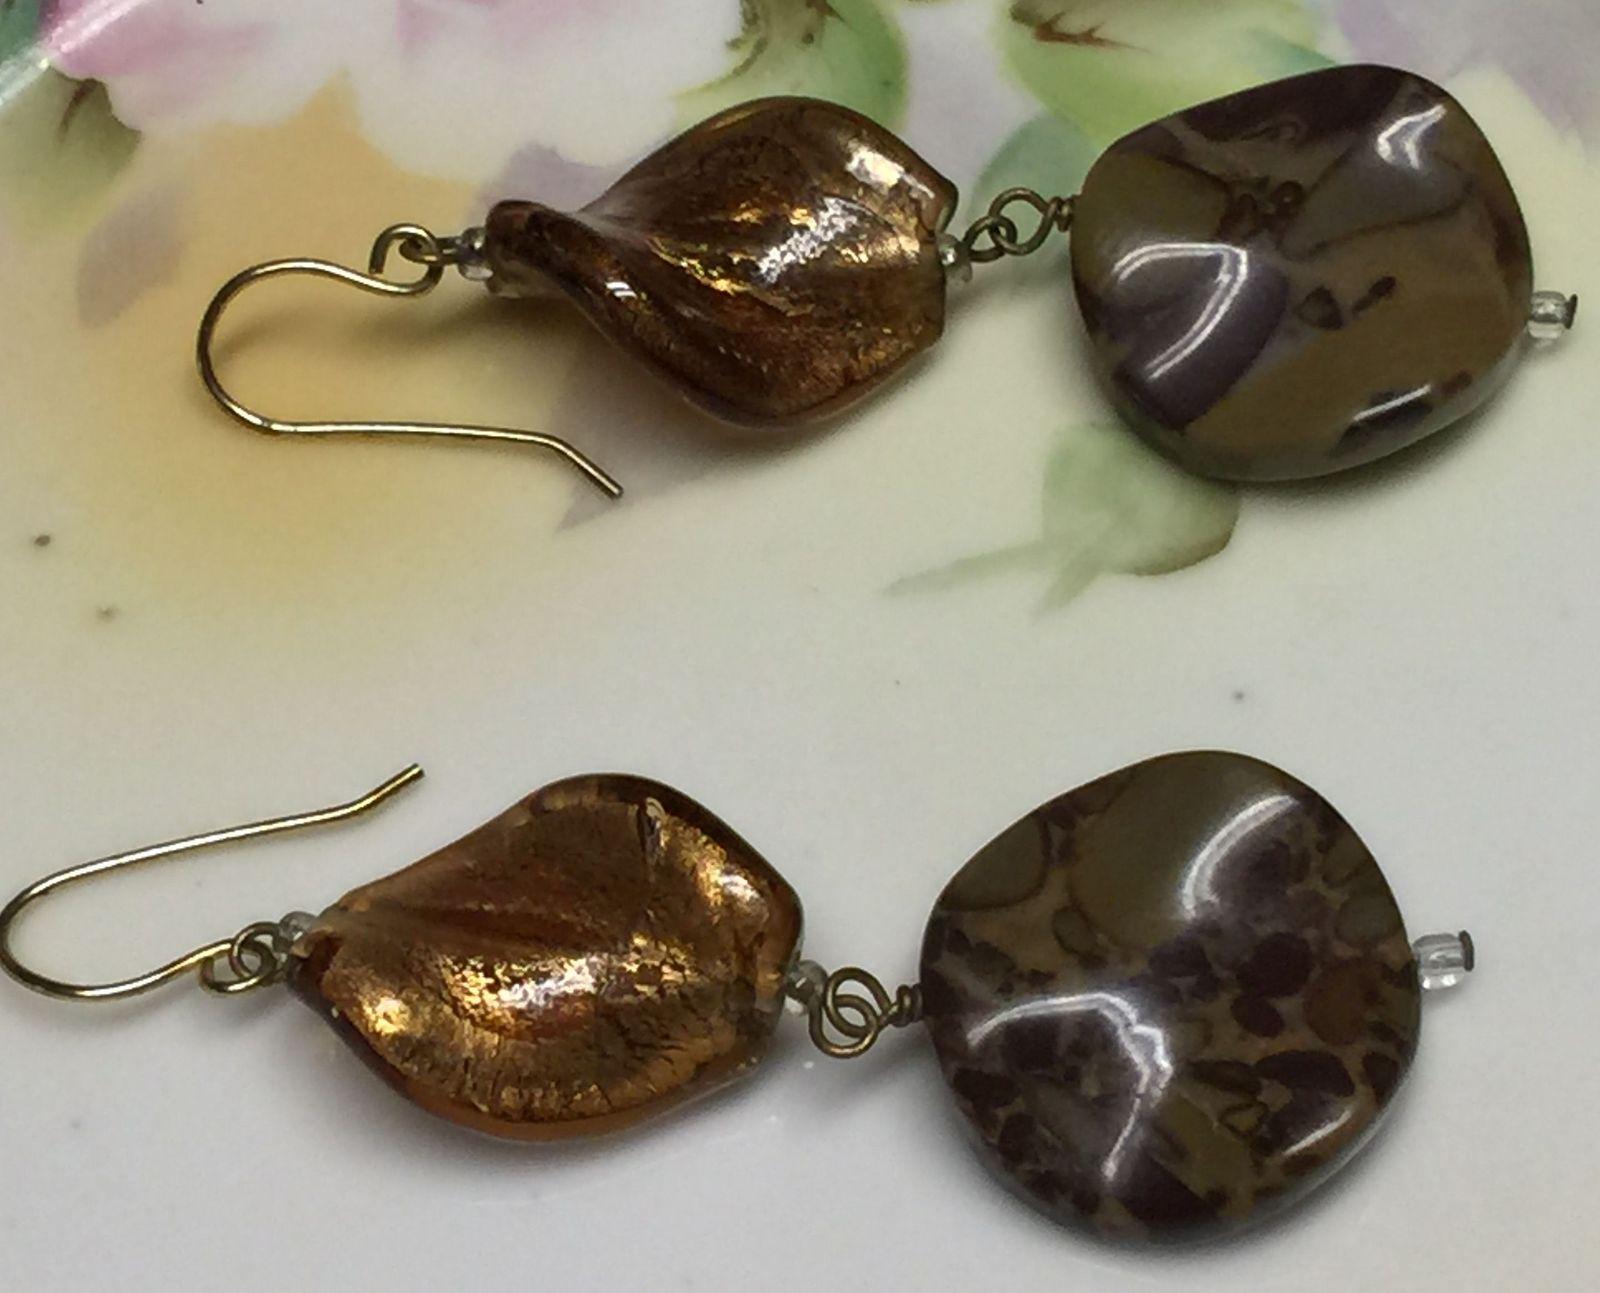 VTG Gold Metallic Brown Marble Look Plastic Beads Long Dangling Pierced Earrings image 3